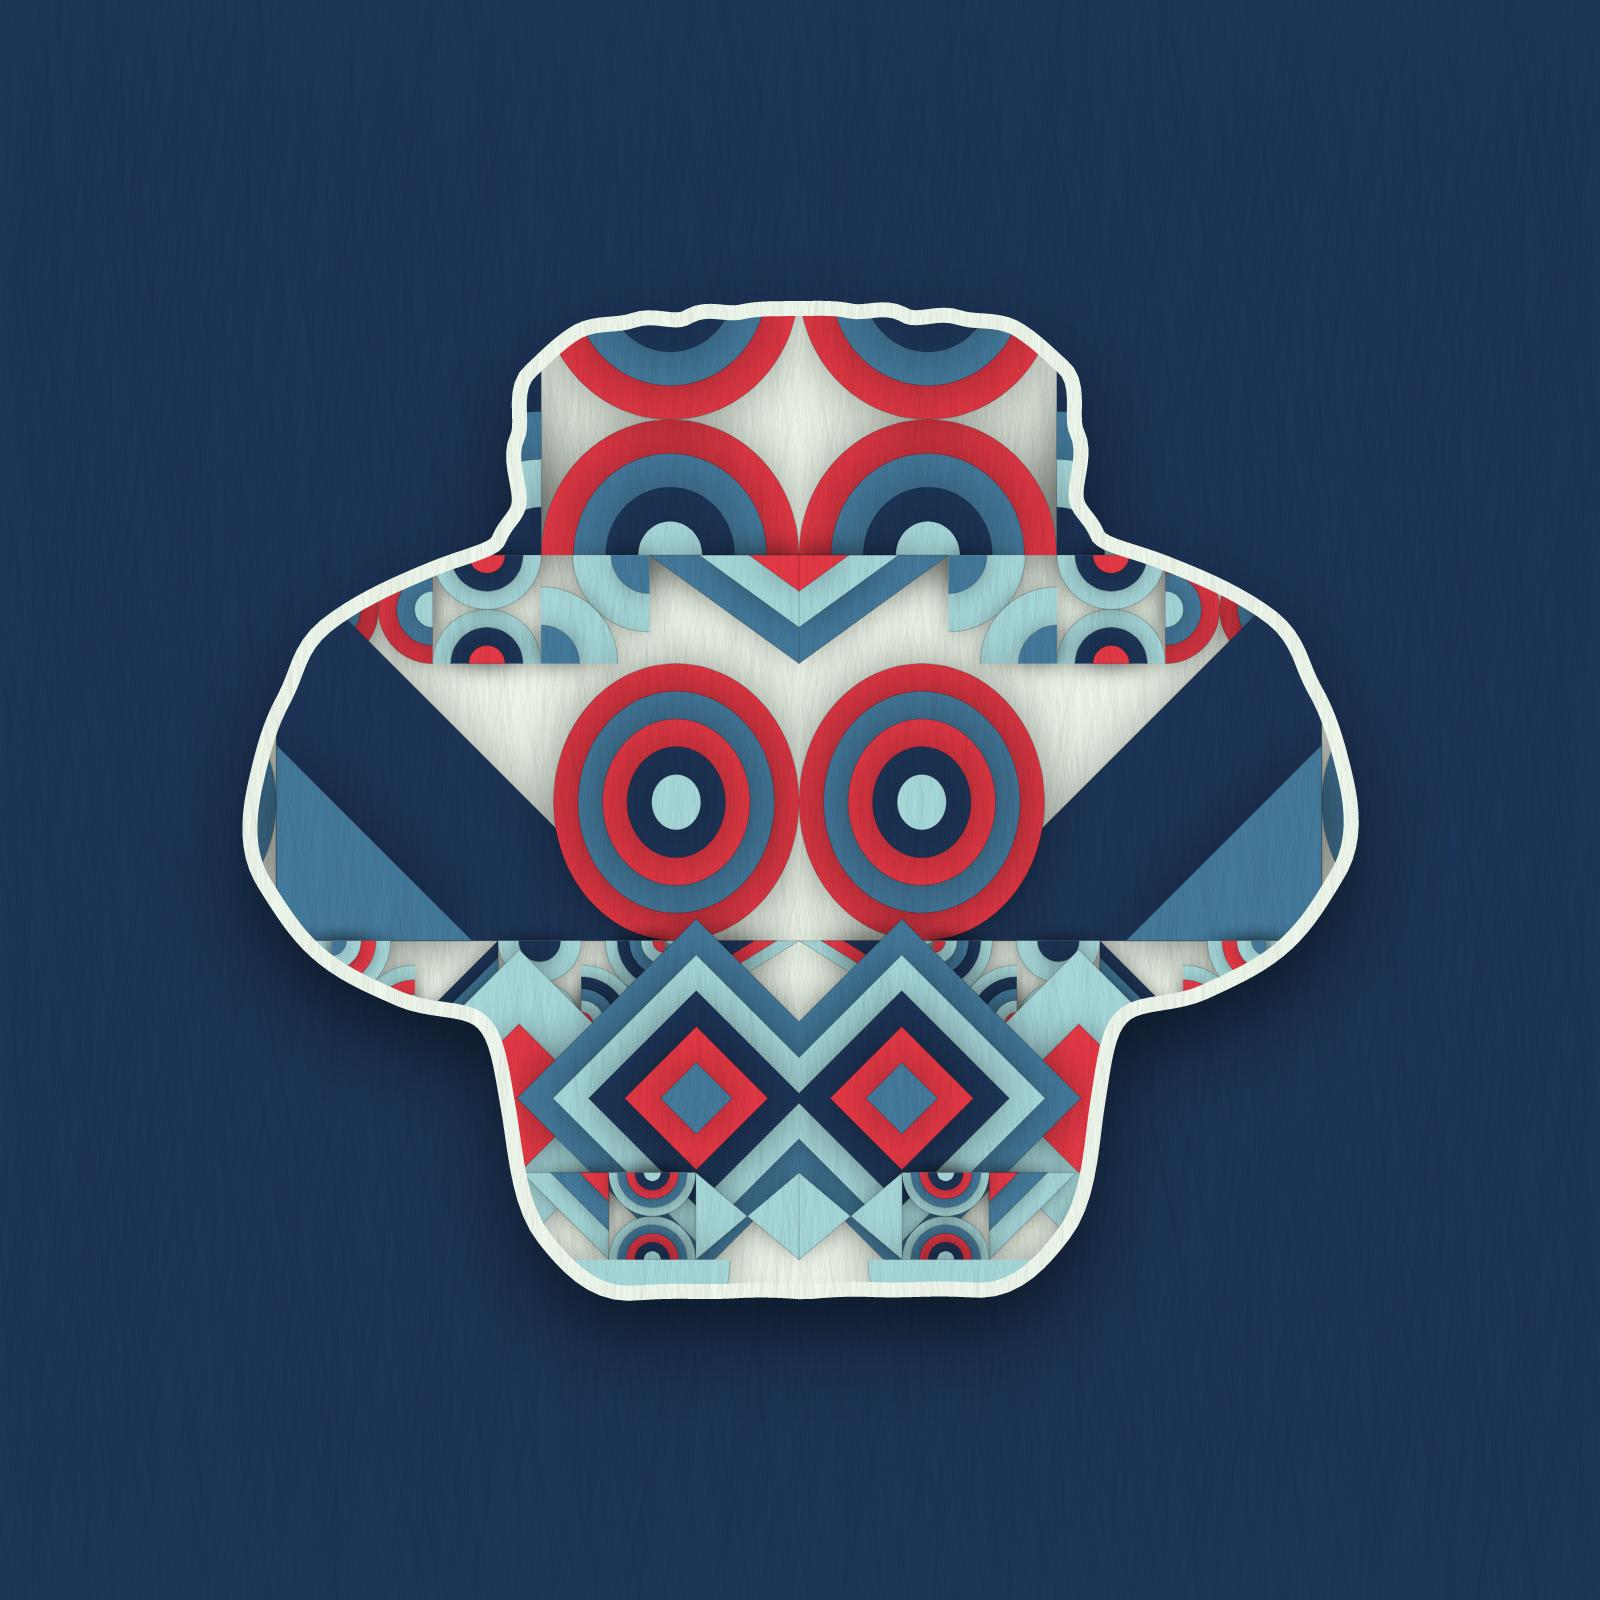 Generativemasks #9883